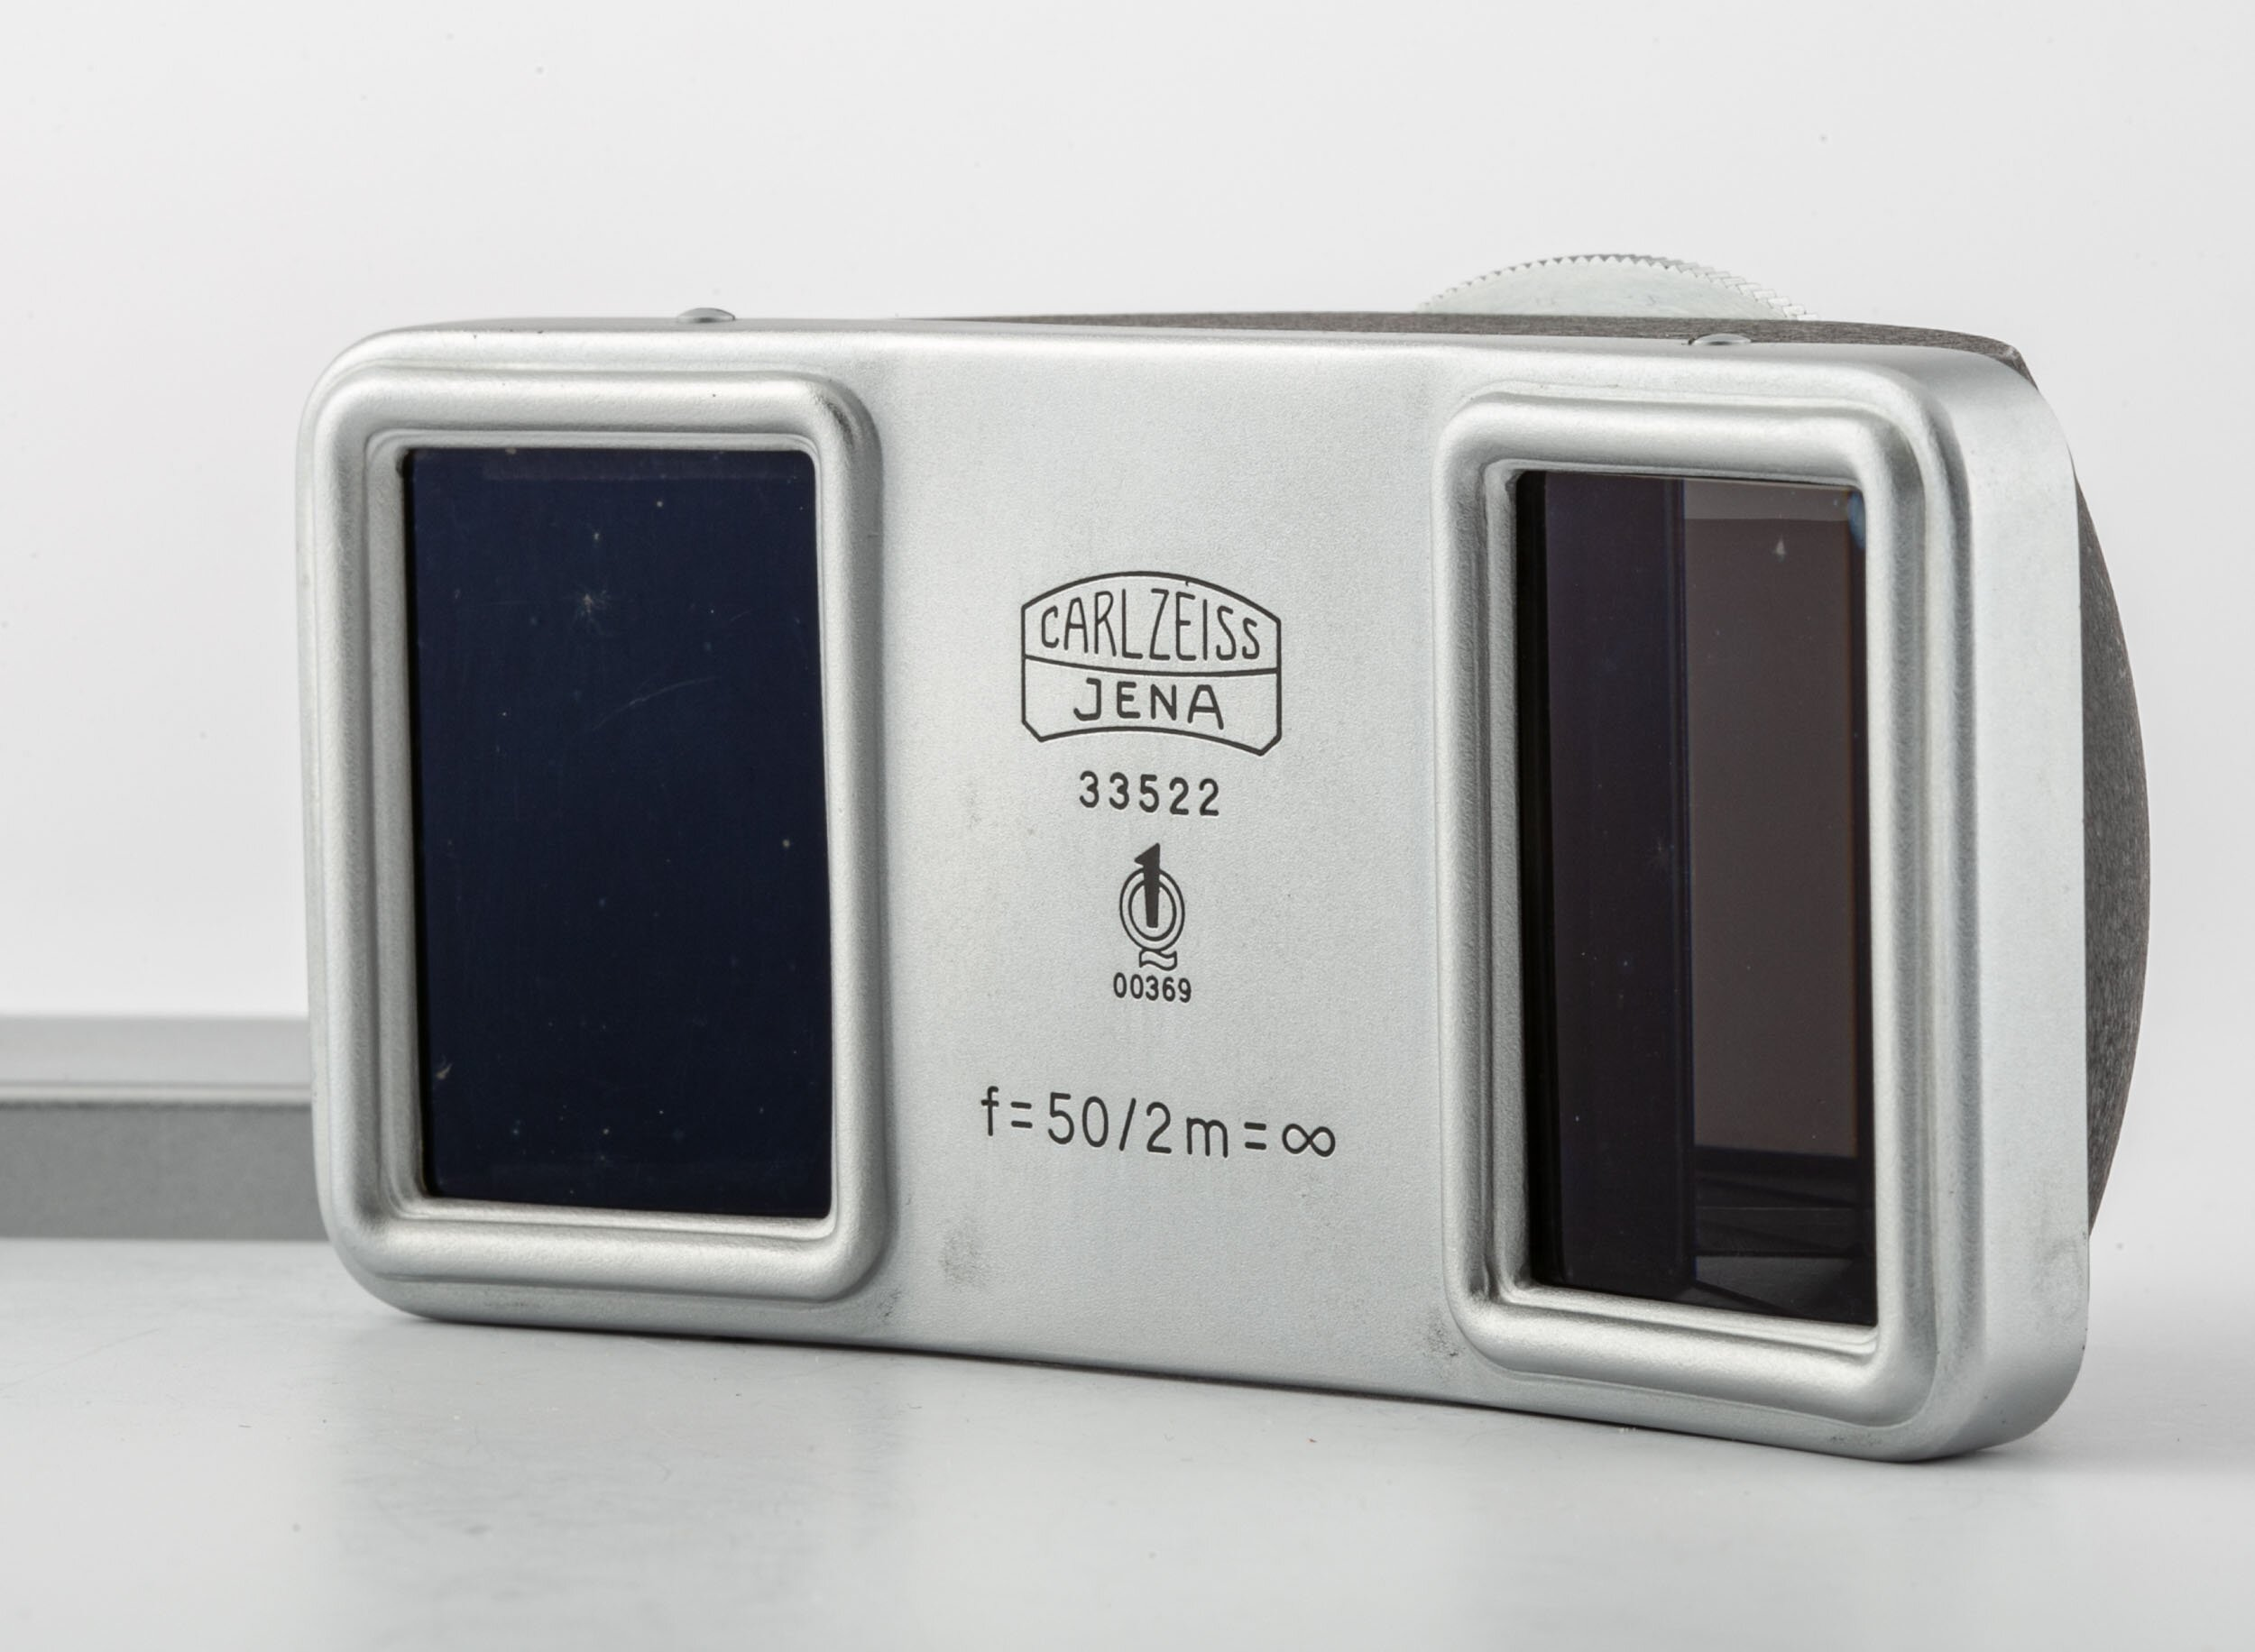 Carl Zeiss Stereovorsatz 50mm/2m = ∞